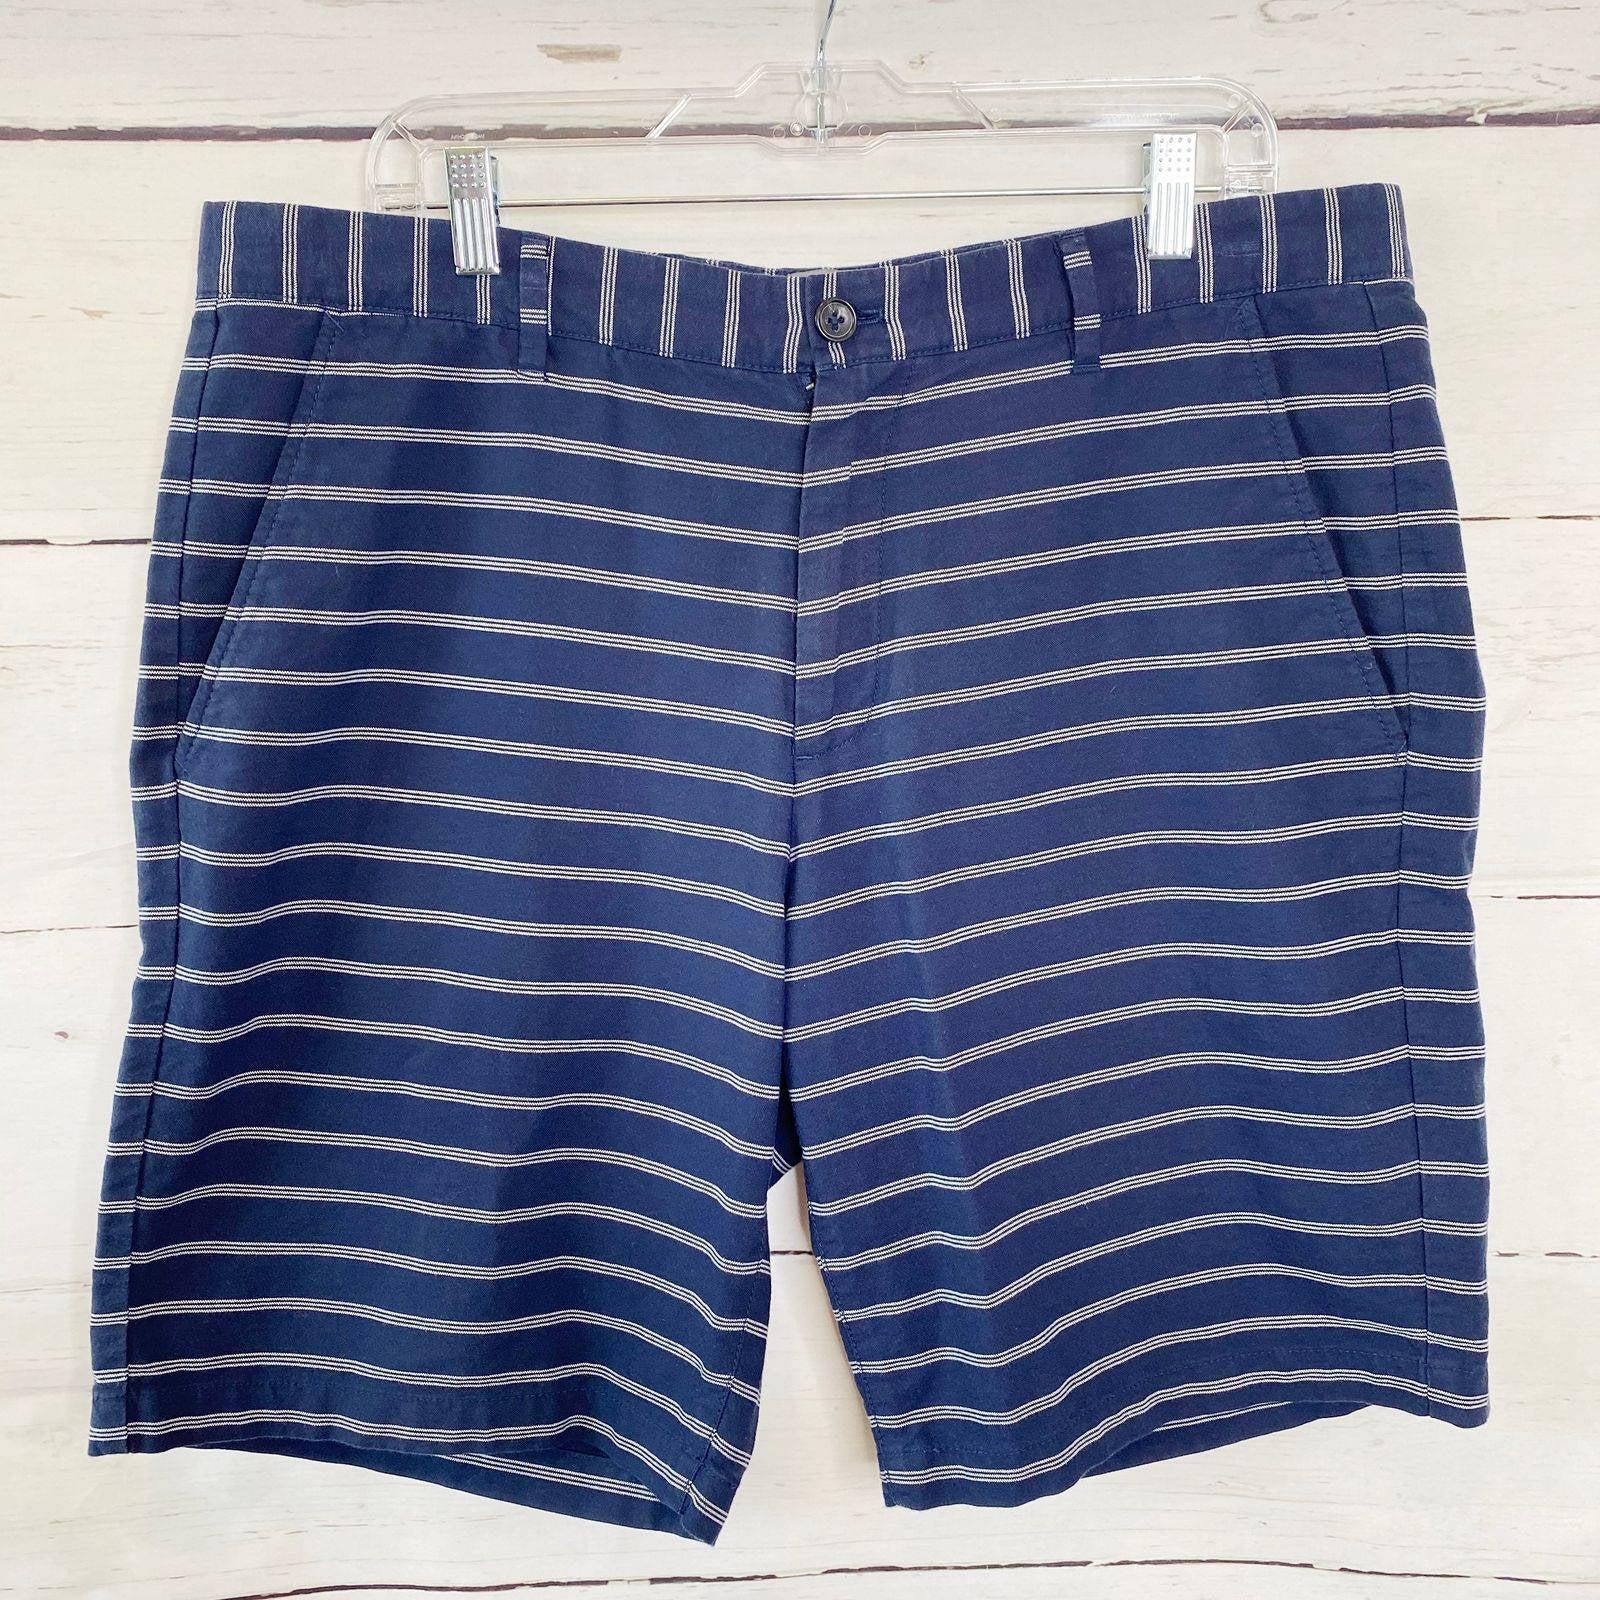 GAP Men's Classic Navy Striped Shorts